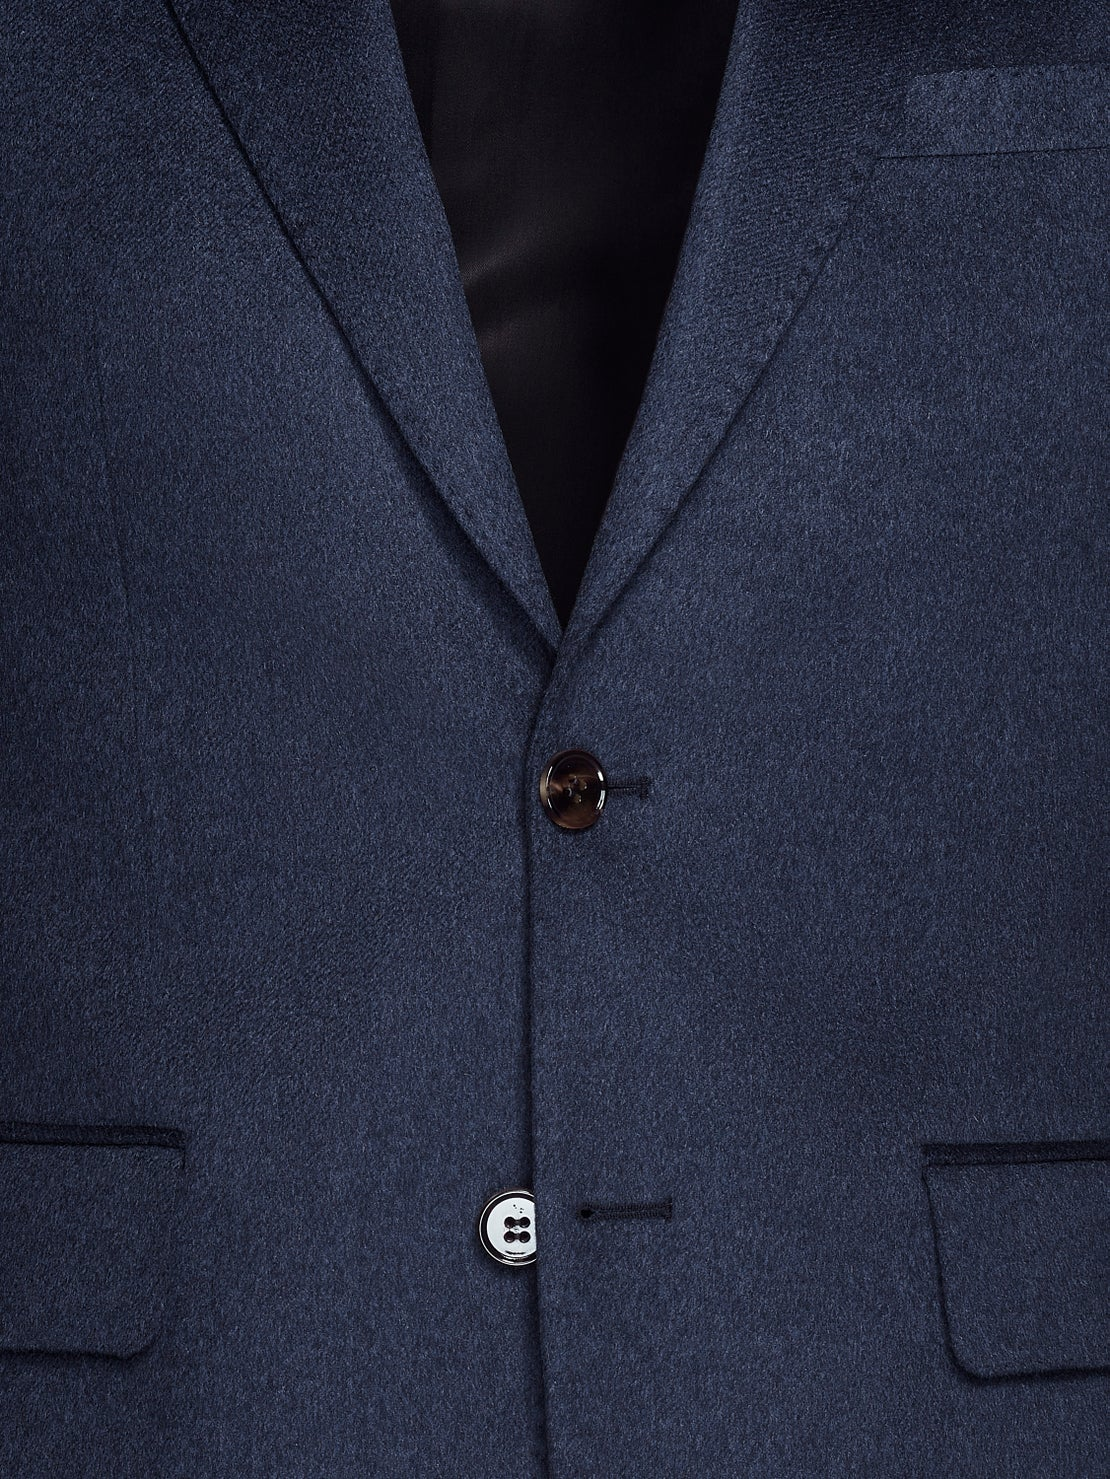 Blue Cashmere Jacket